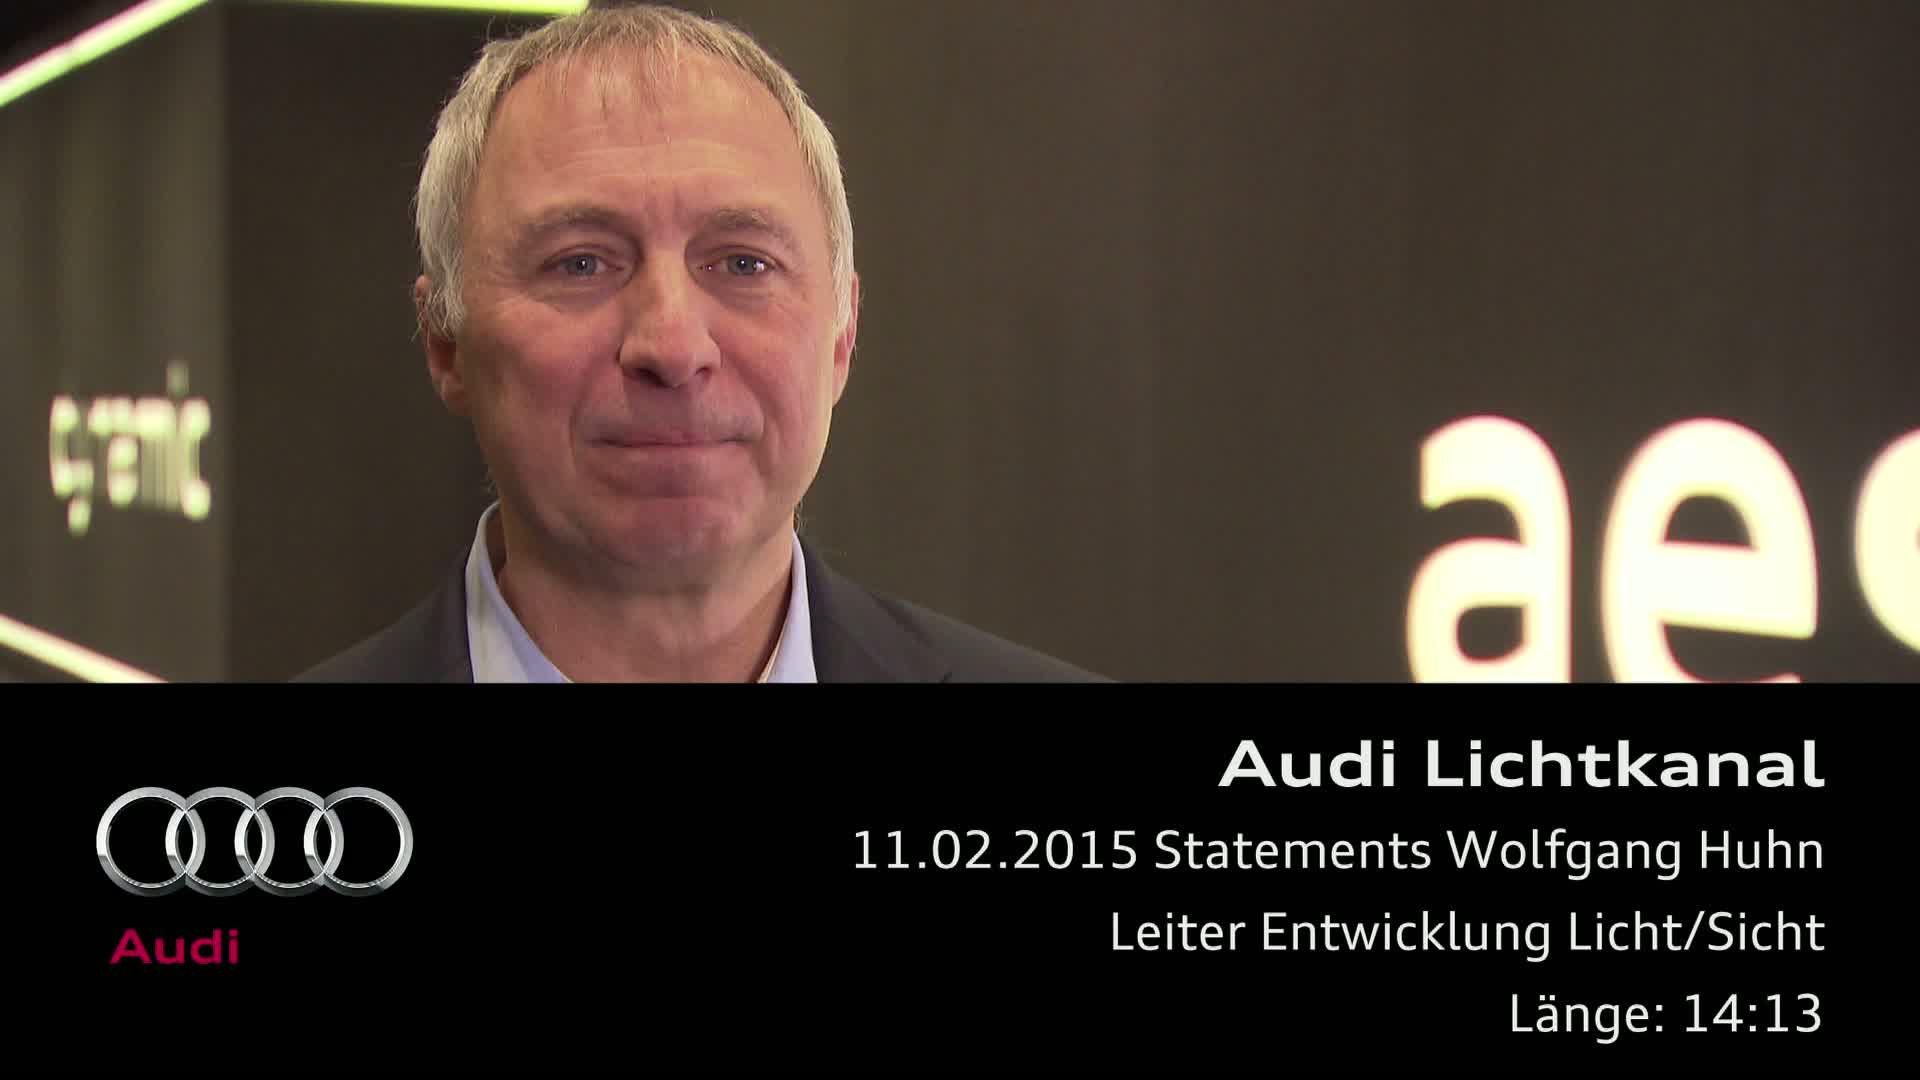 Audi Lichtkanal - Statement Wolfgang Huhn